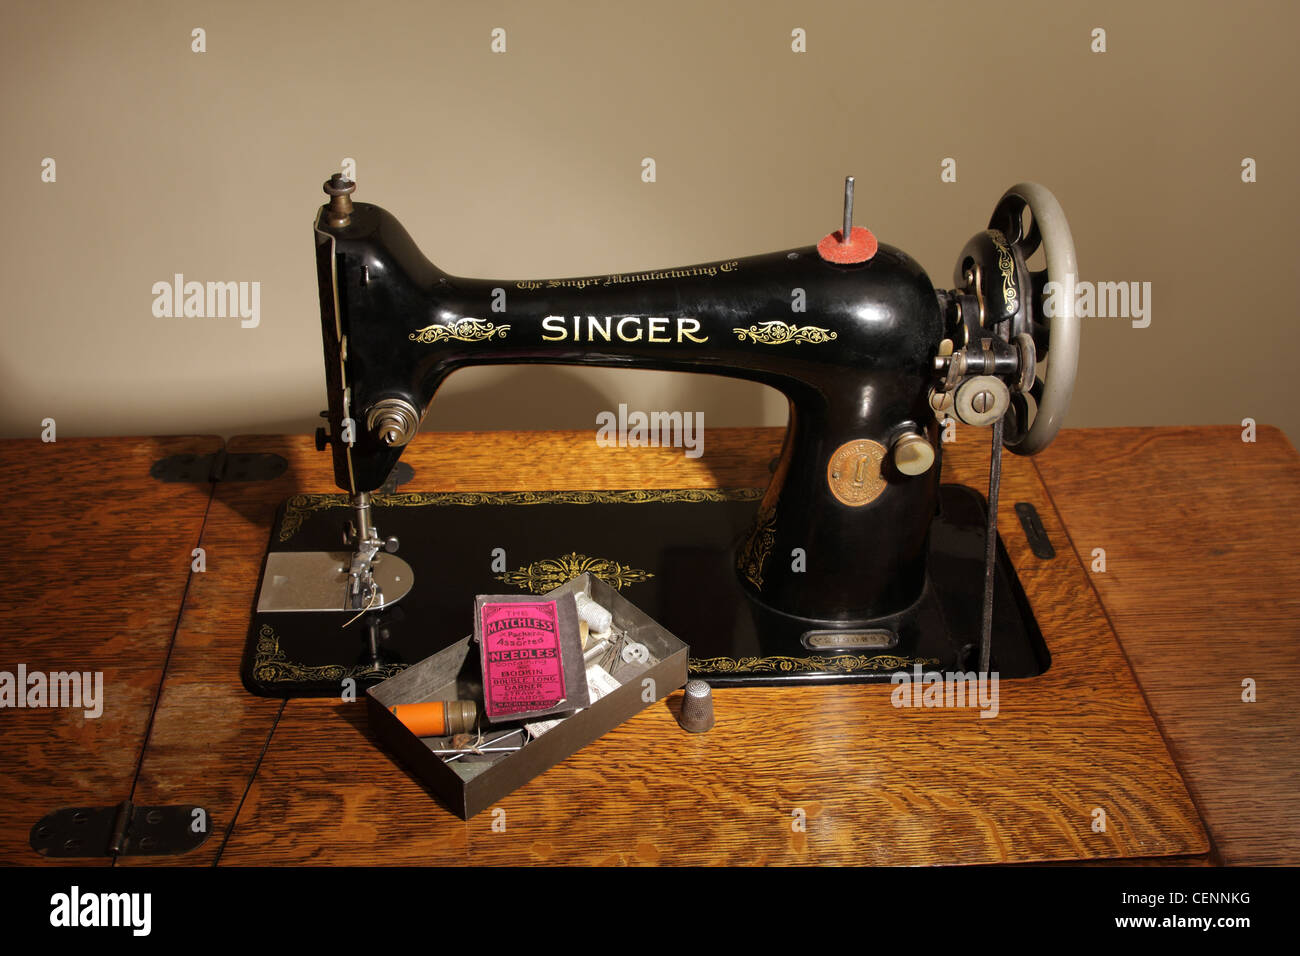 singer treadle 27 sewing machine manual